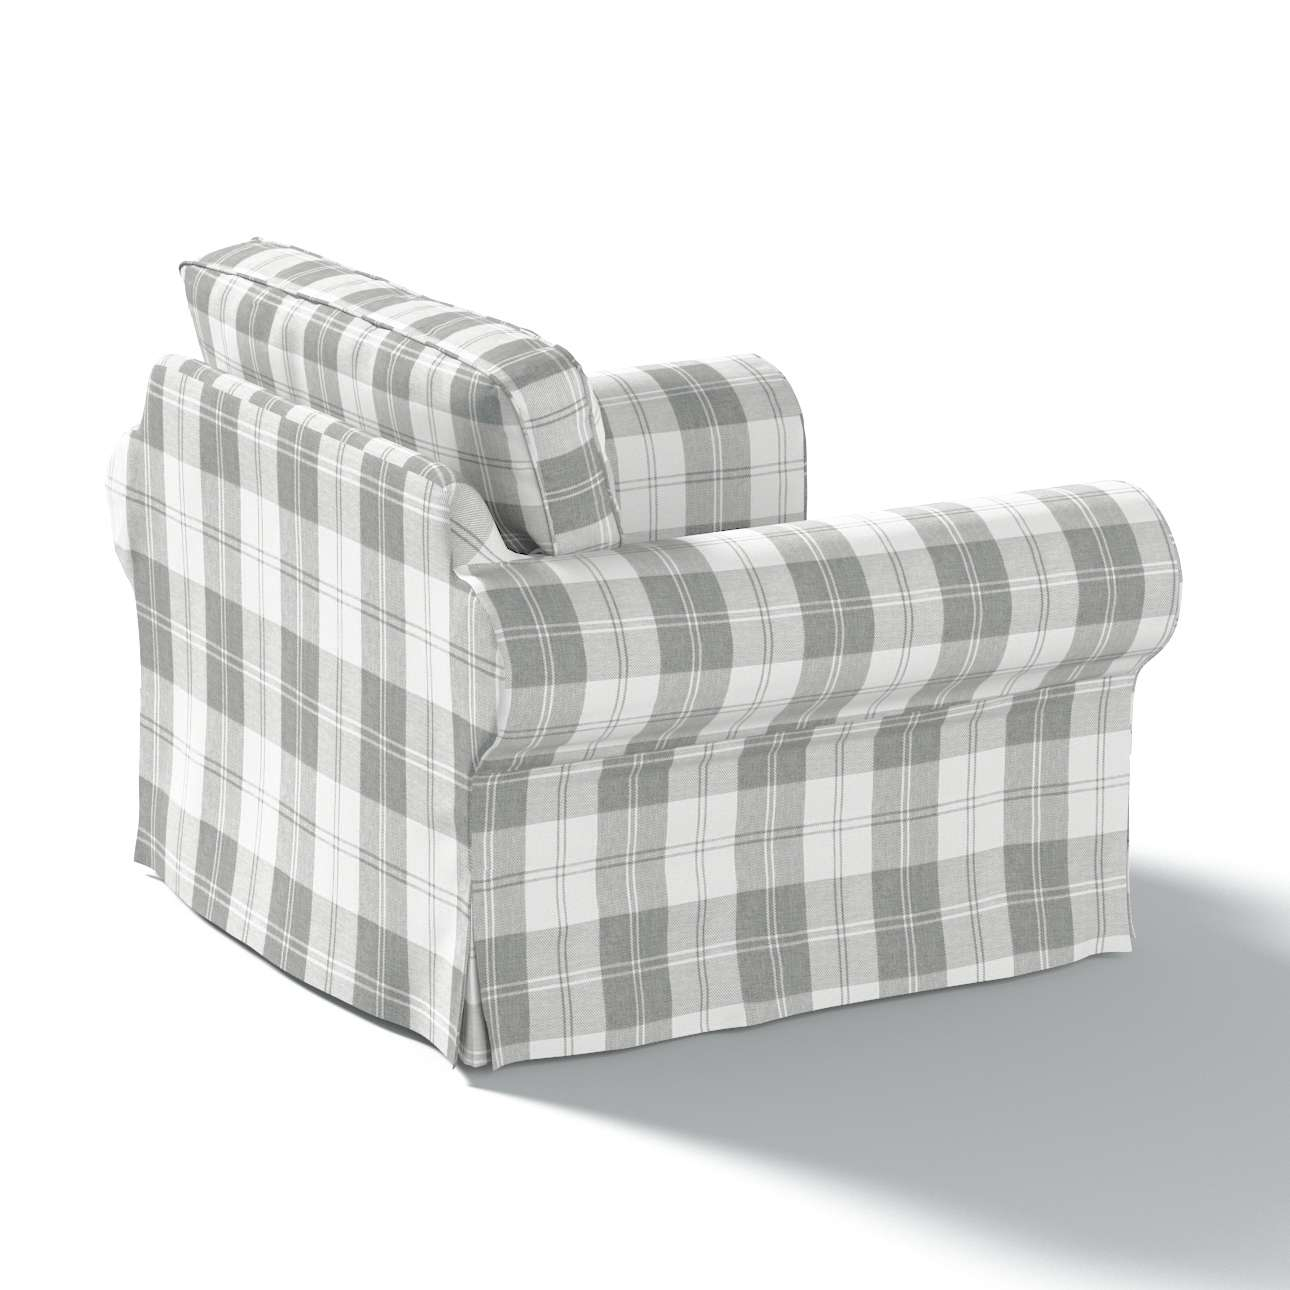 Ektorp Sesselbezug Sesselhusse, Ektorp Sessel von der Kollektion Edinburgh , Stoff: 115-79